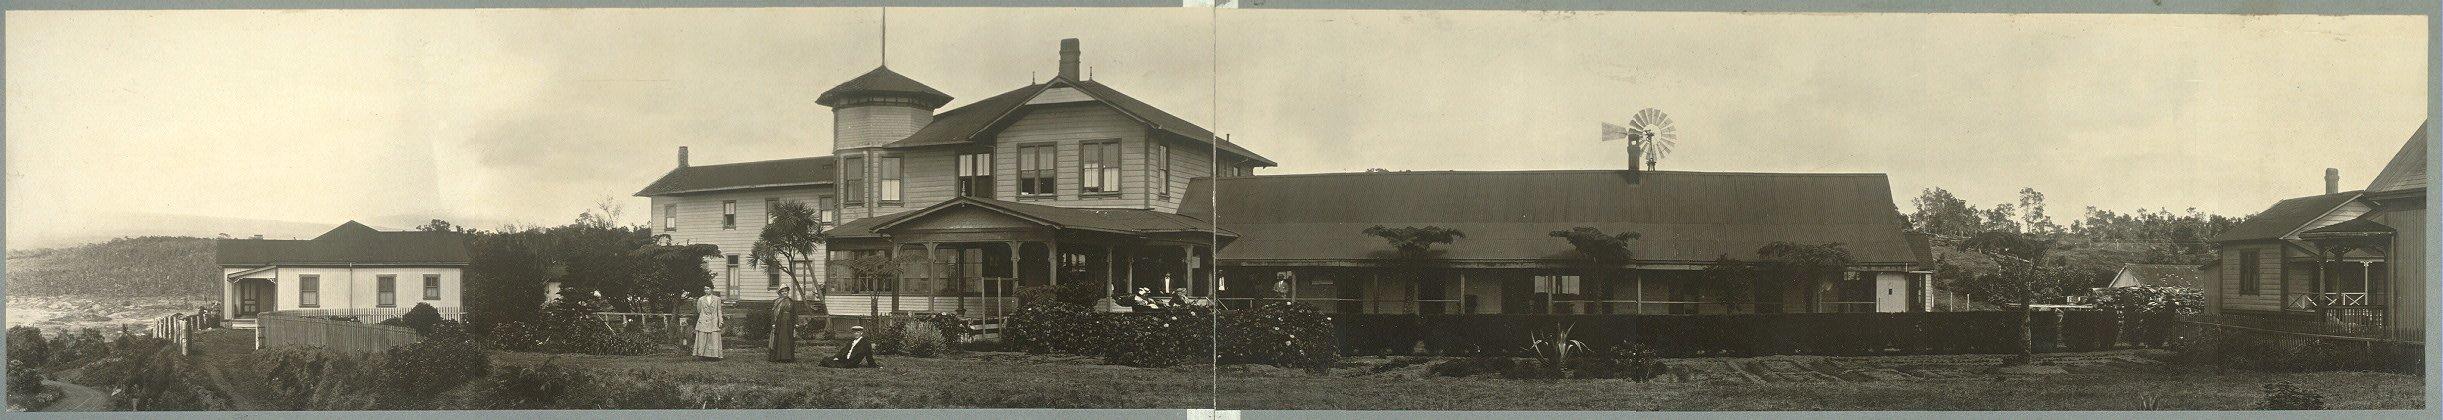 George Lycurgus Volcano House hotel